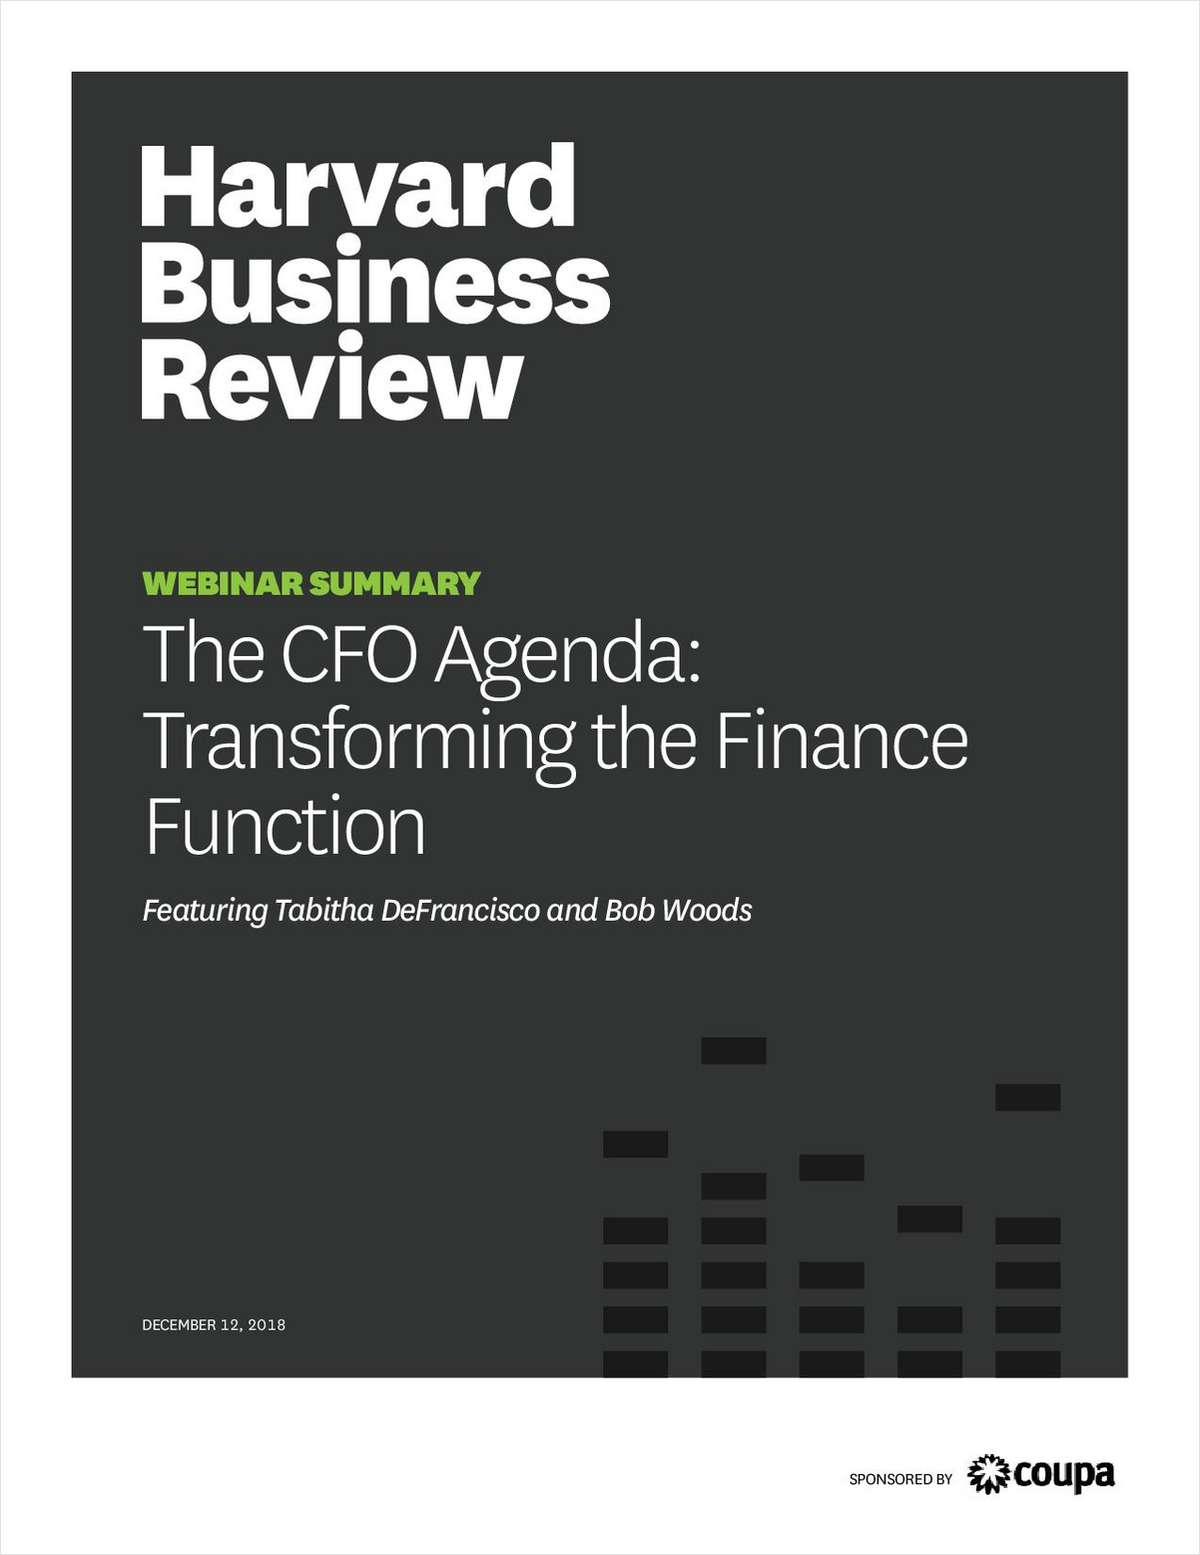 THE CFO AGENDA: TRANSFORMING THE FINANCE FUNCTION